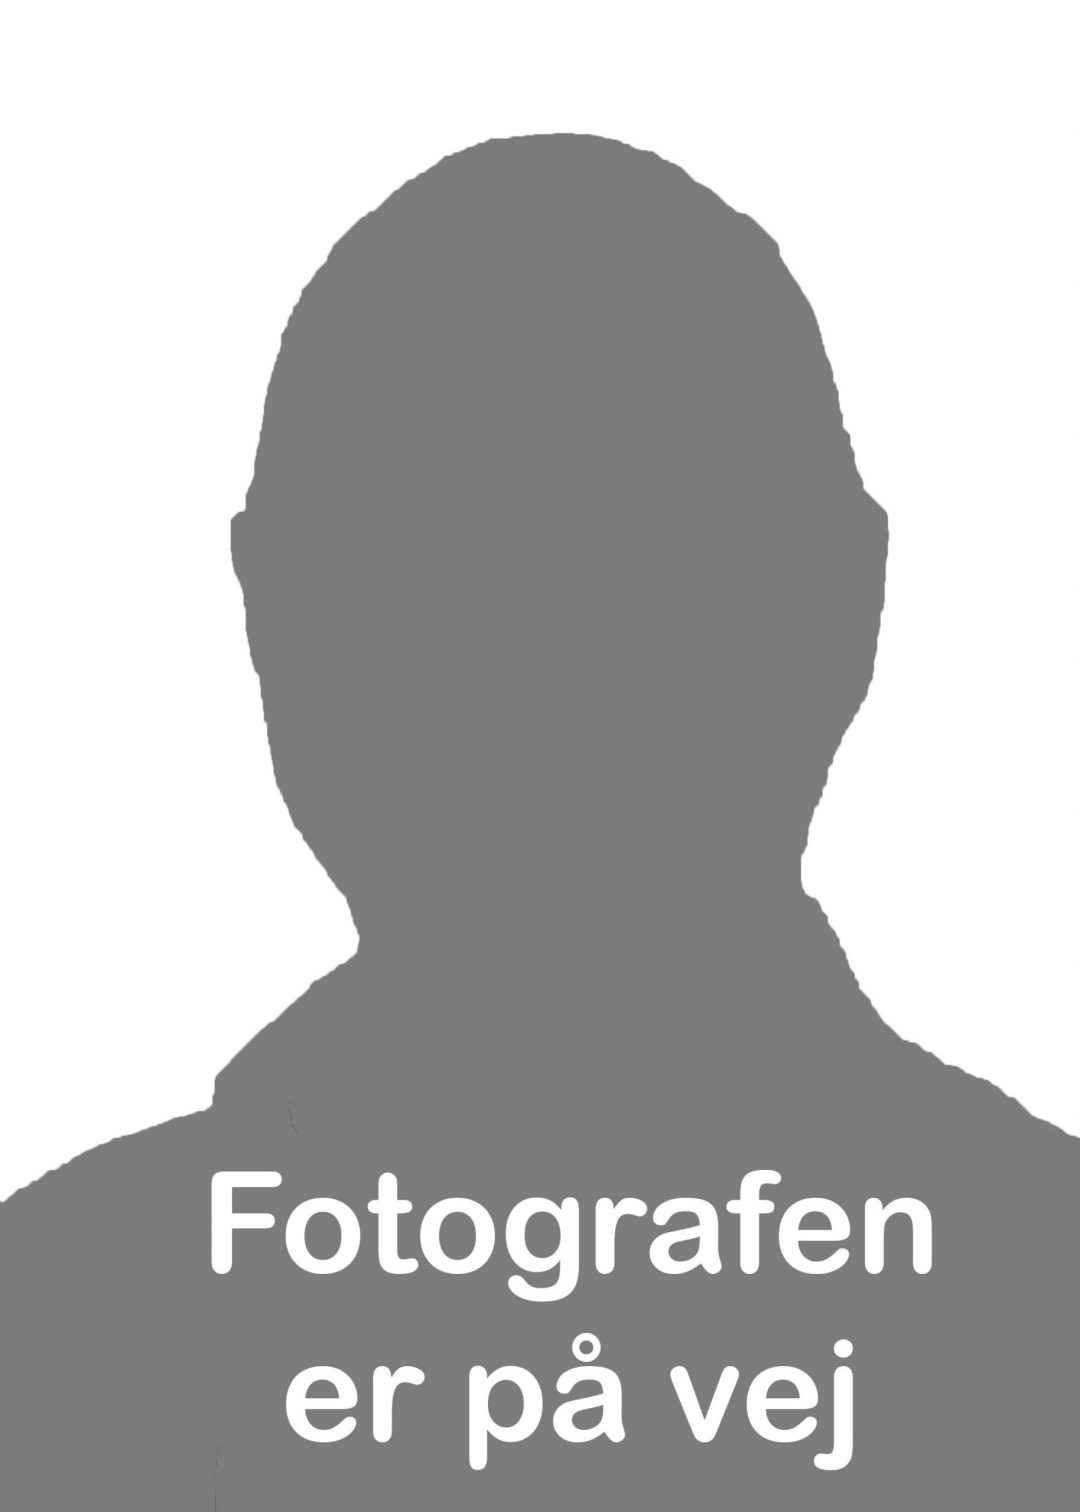 Lasse Bostrup Kull